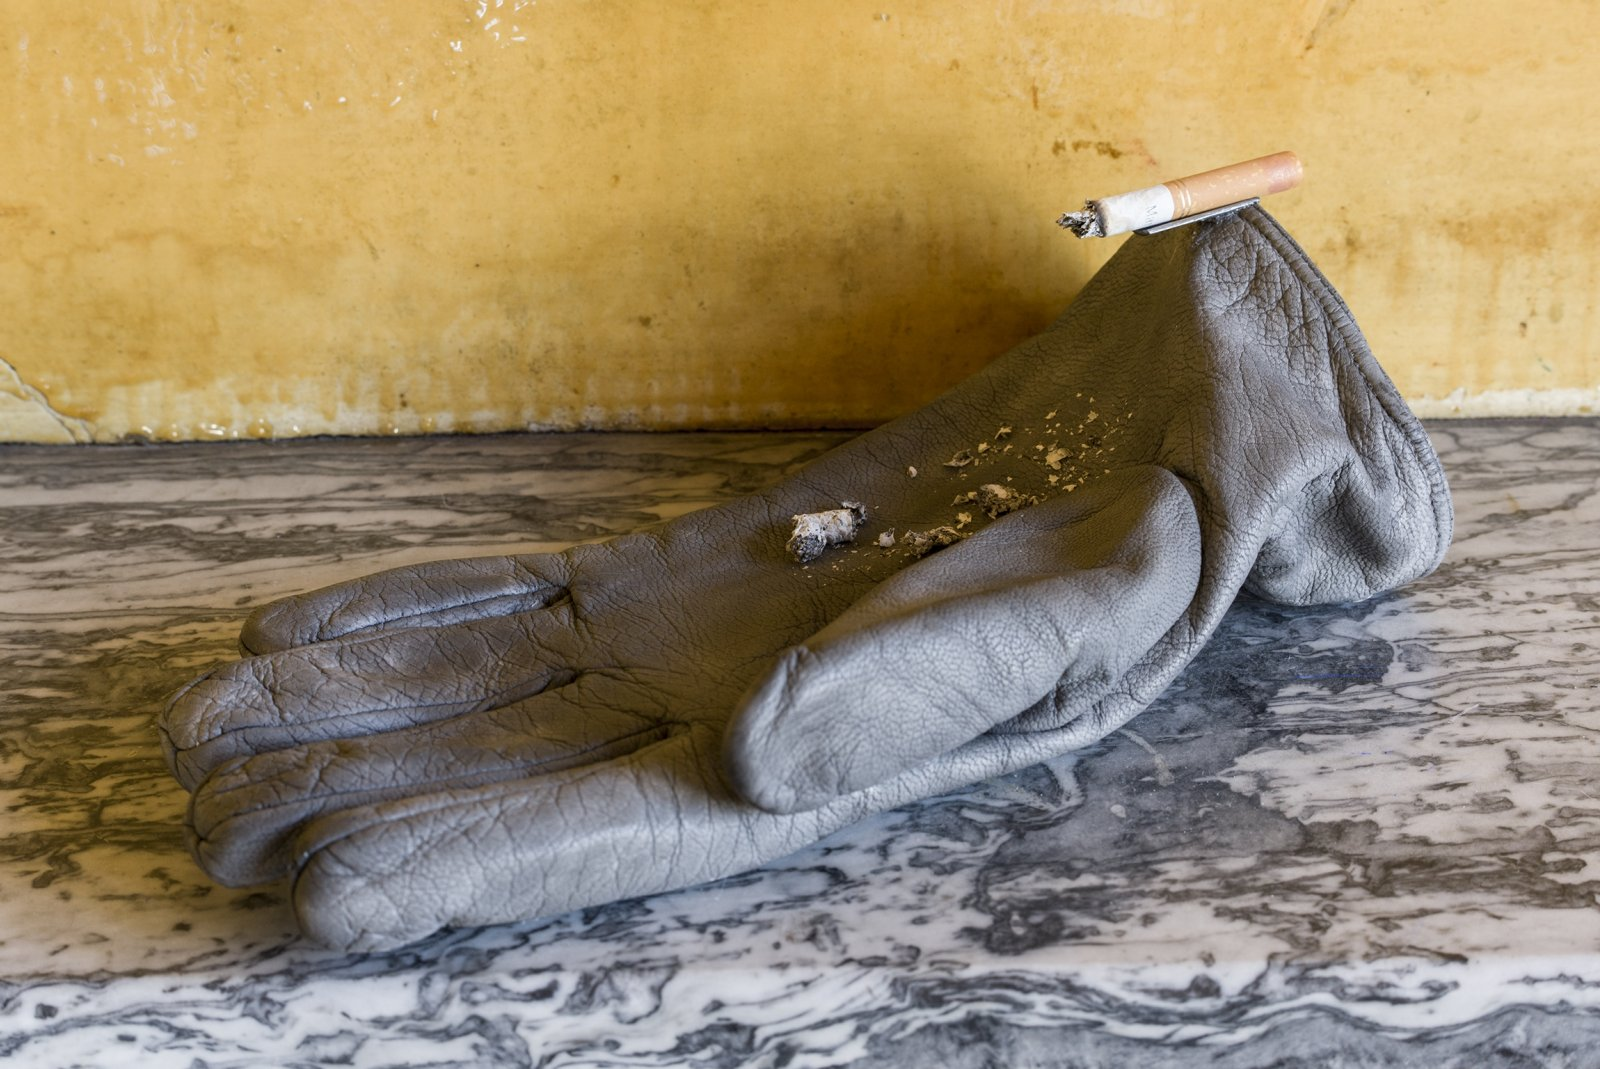 Liz Magor, Leather Palm, 2019, polymerized gypsum, cigarette, metal, 11 x 6 x 4 in. (28 x 15 x 10 cm). Installation view, TIMESHARE, The David Ireland House, 500 Capp Street Foundation, San Francisco, USA, 2019 by Liz Magor